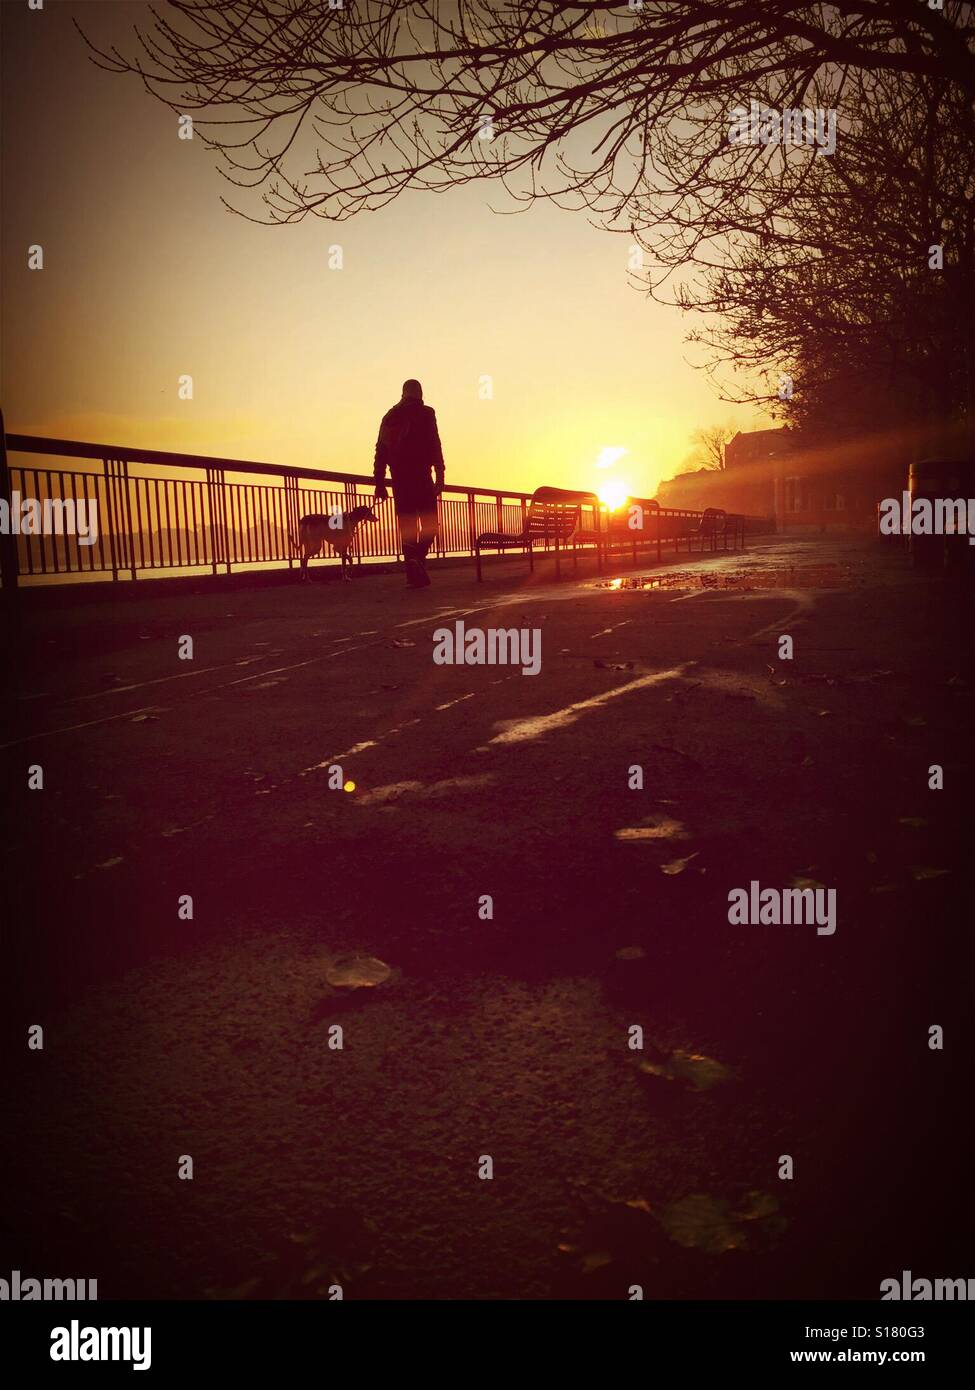 Dog walking on a winter pathway. - Stock Image